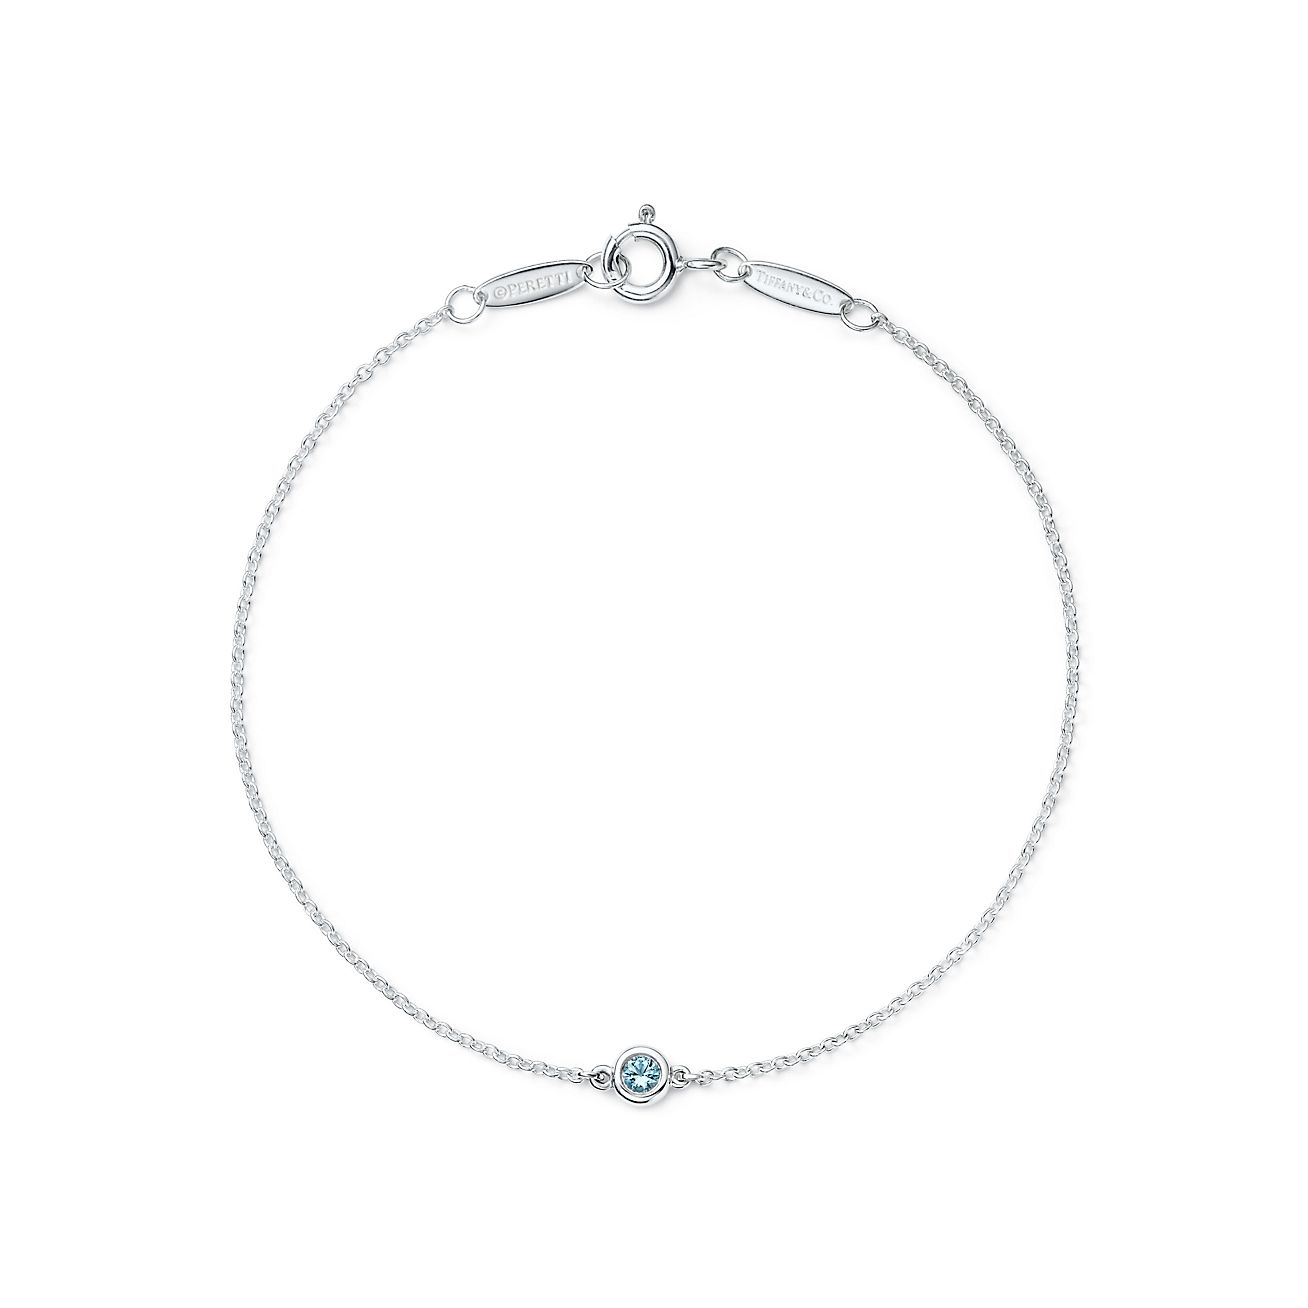 elsa peretticolor by the yard bracelet - Elsa Peretti Color By The Yard Ring